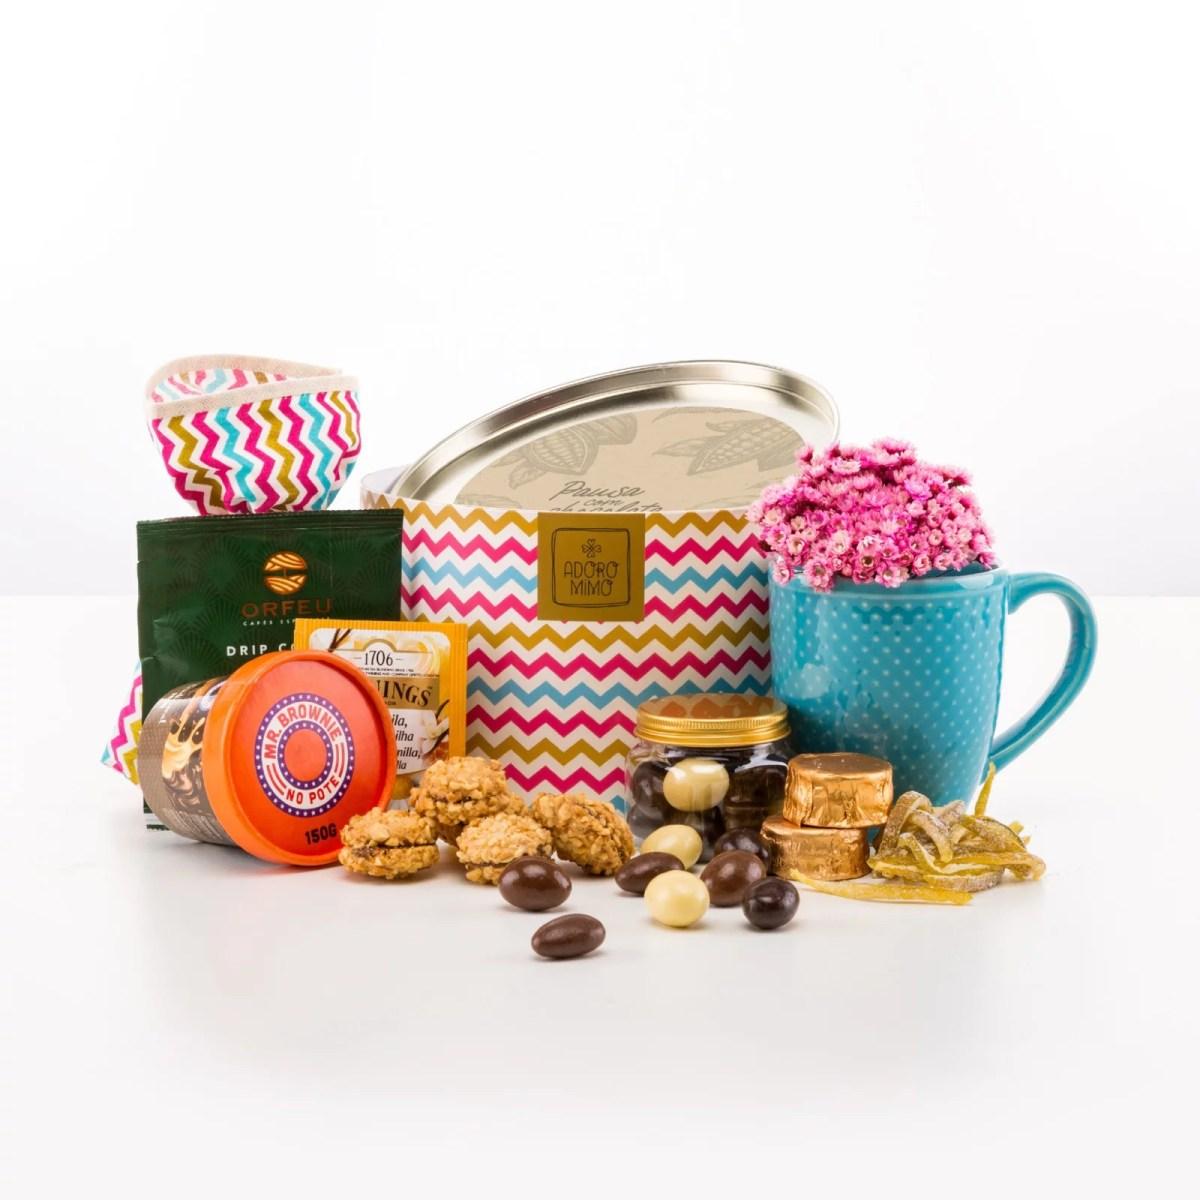 lata-pausa-com-chocolate-chevron-aberta